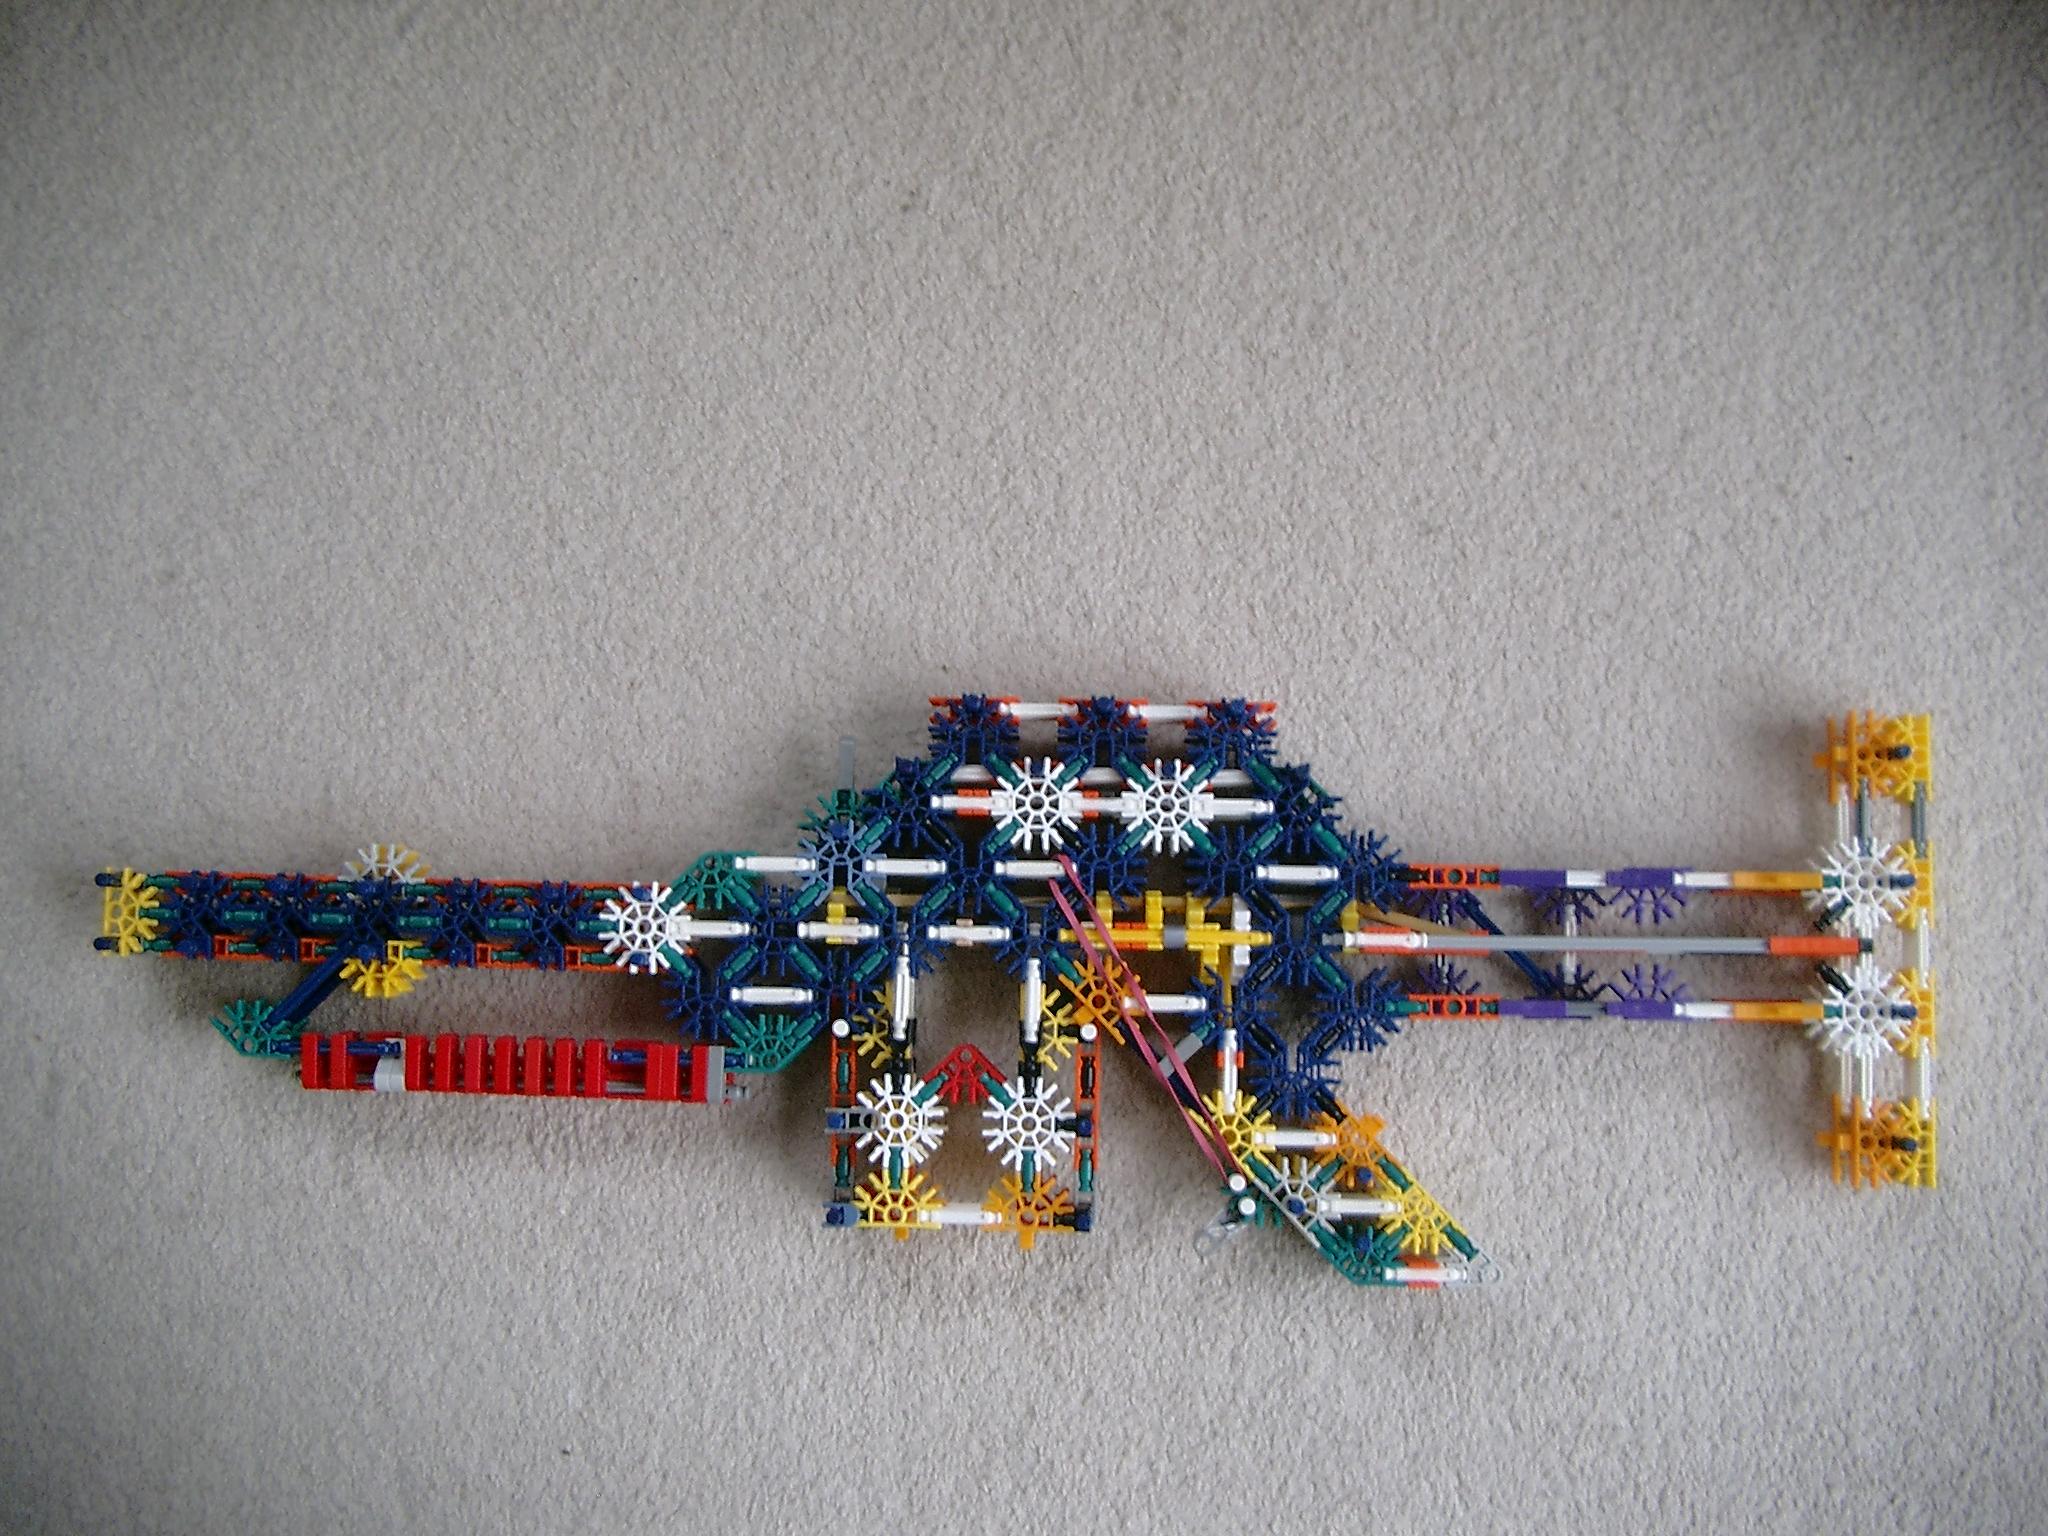 The storm 220 V1.7 knex bolt action rifle.